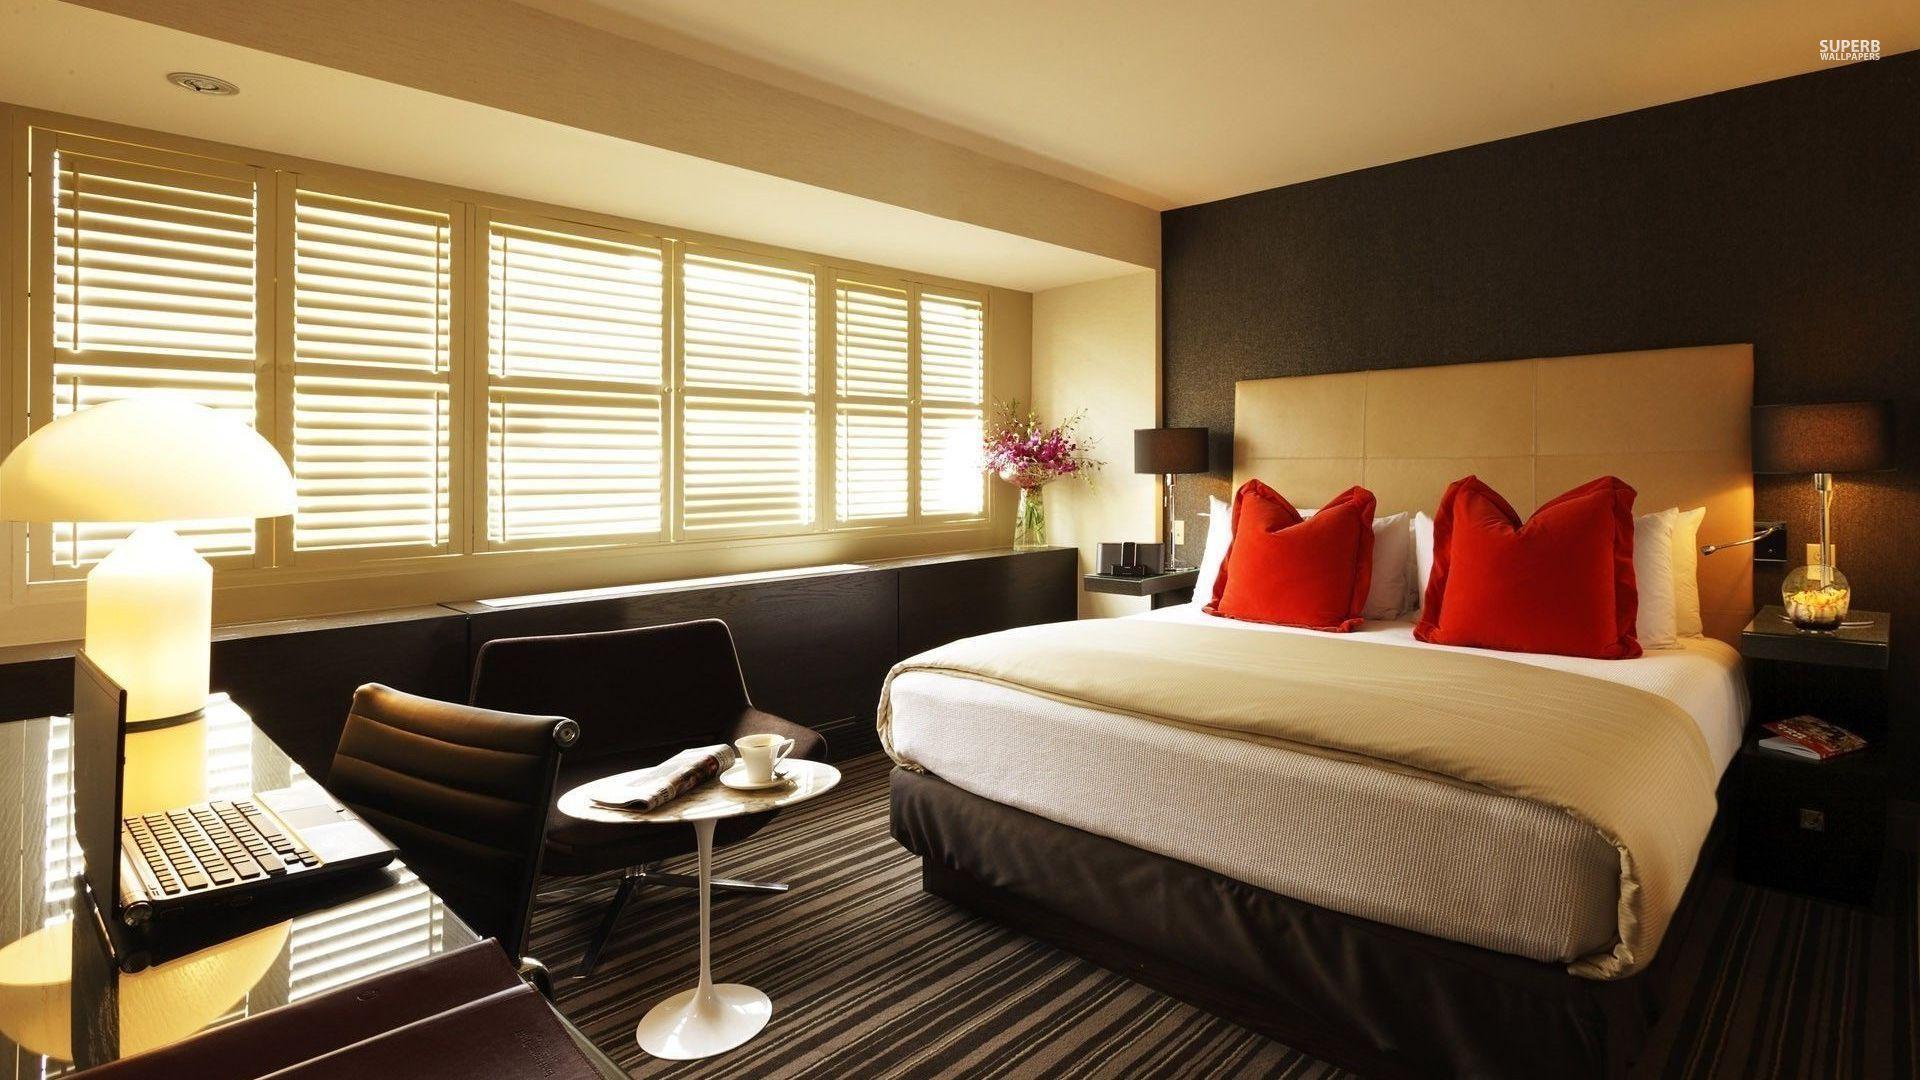 Hotel 1080p